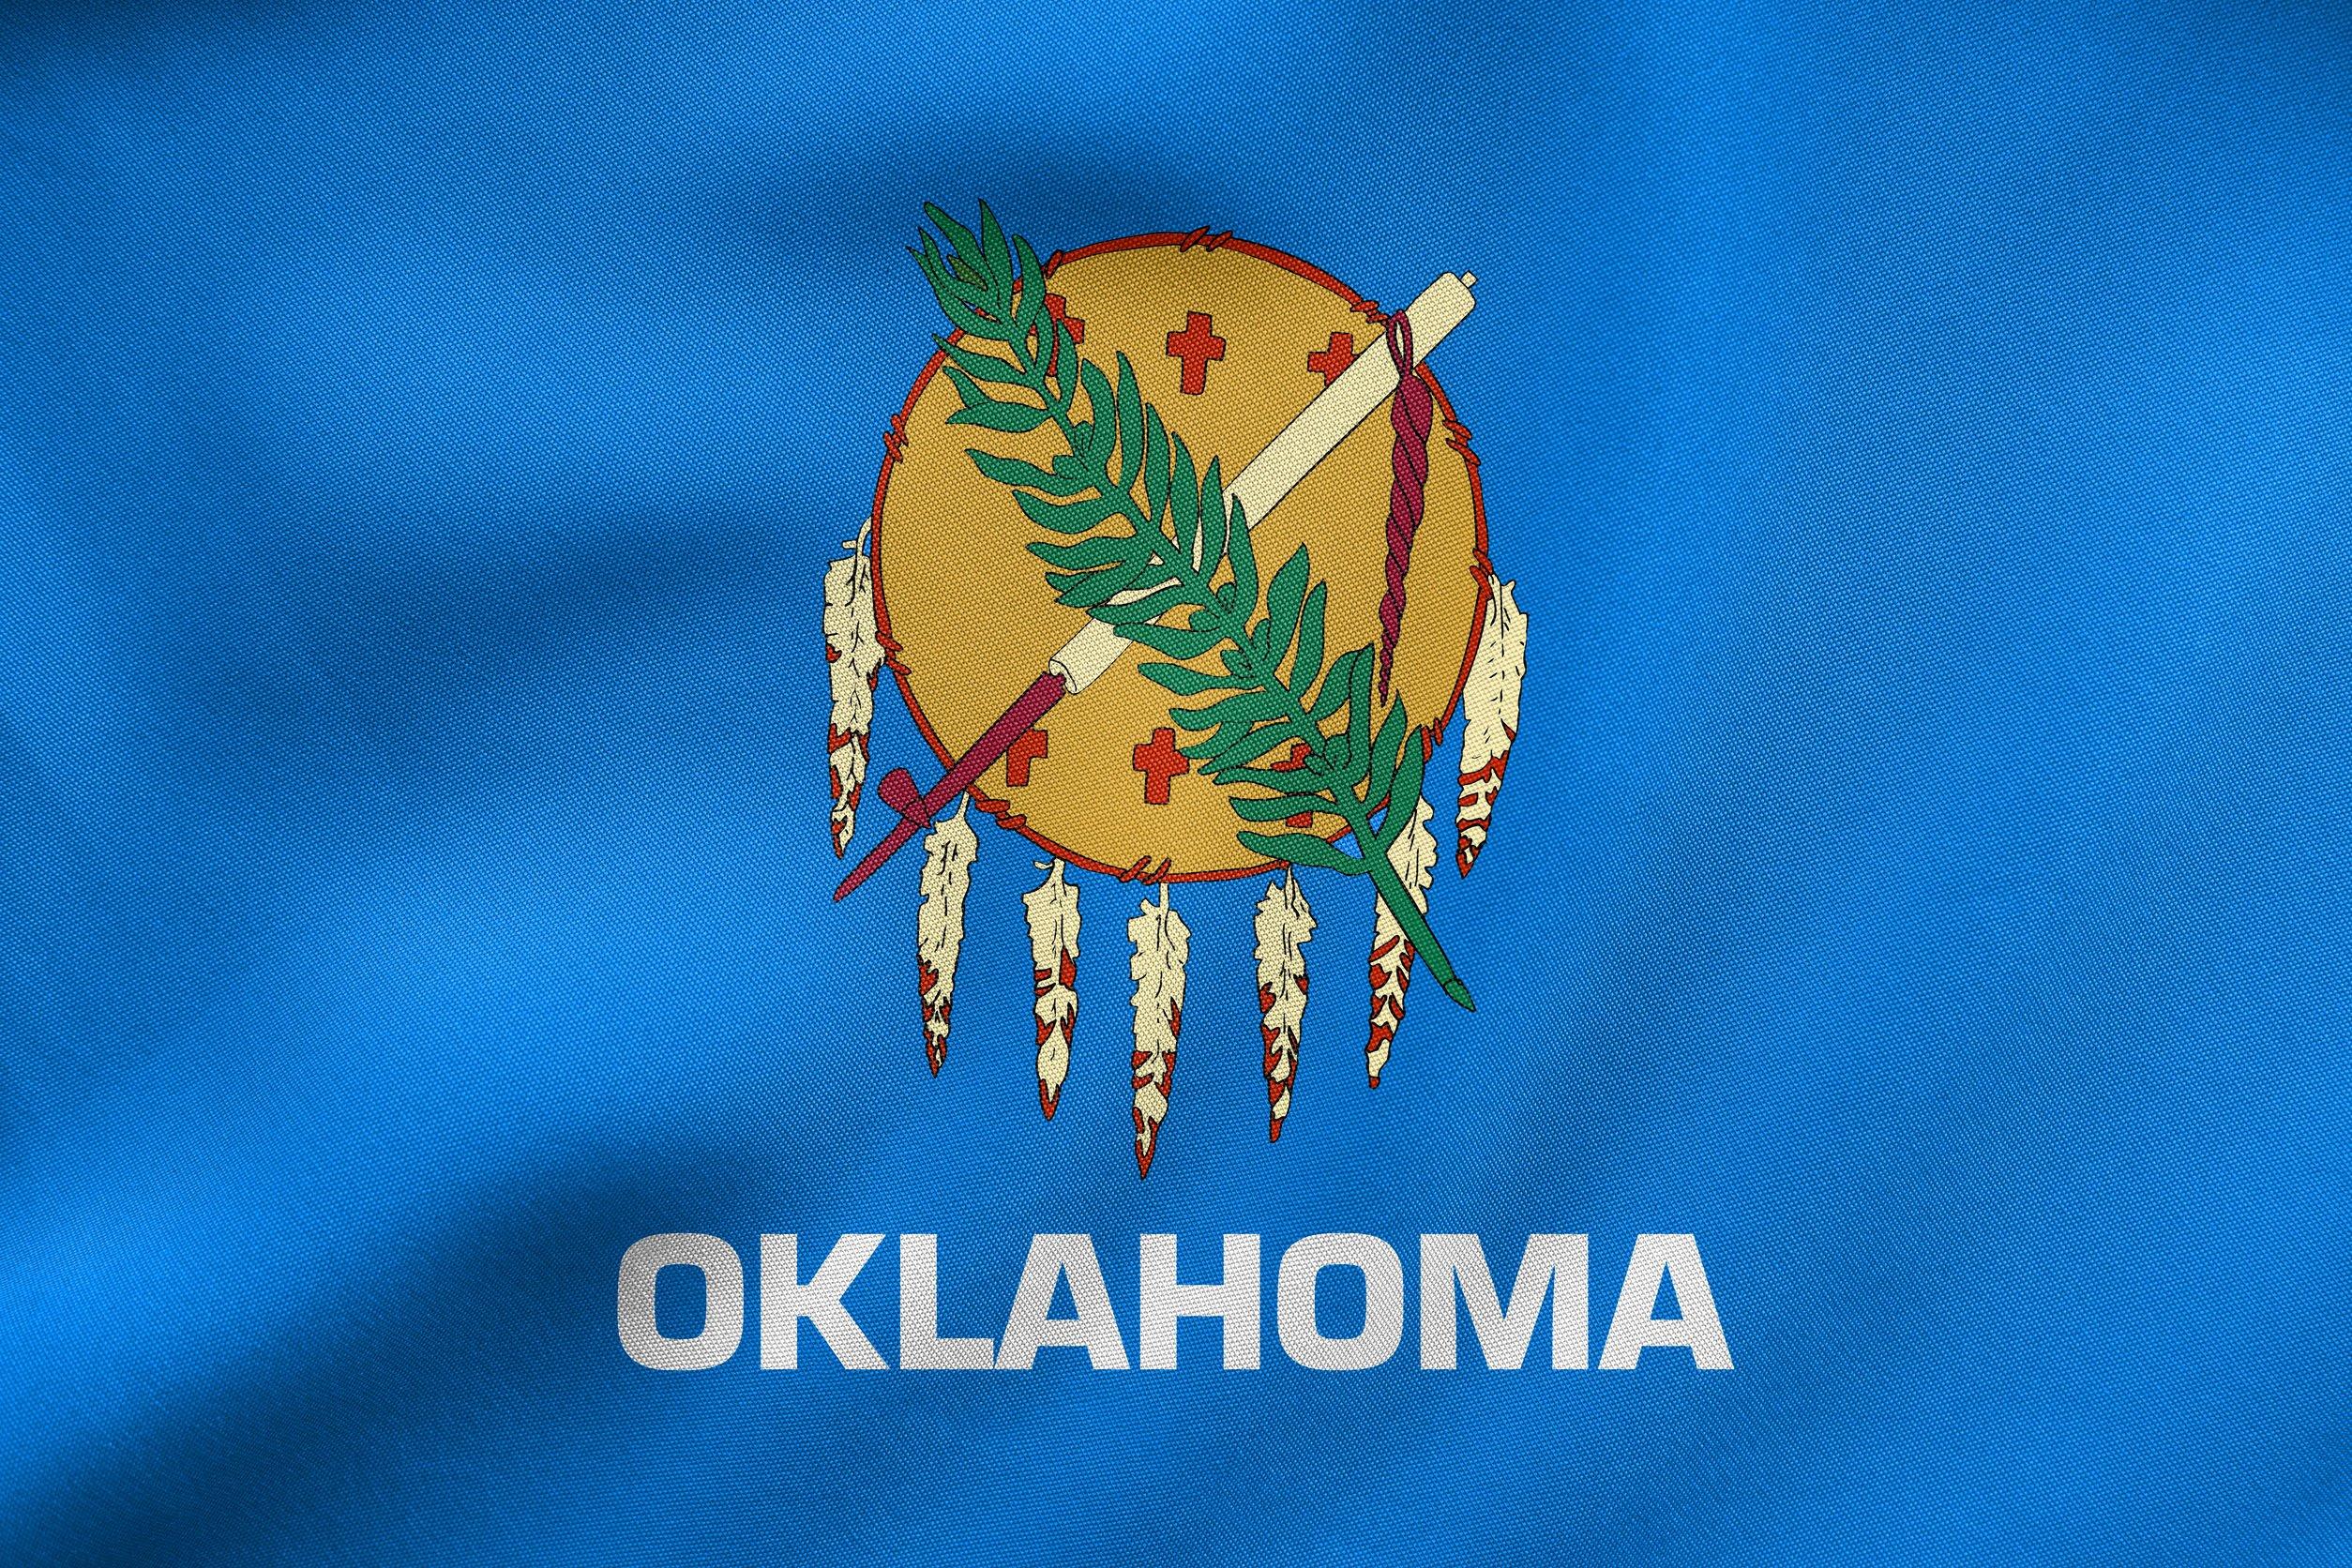 Oklahoma has OK'd more than 1,000 medical marijuana businesses